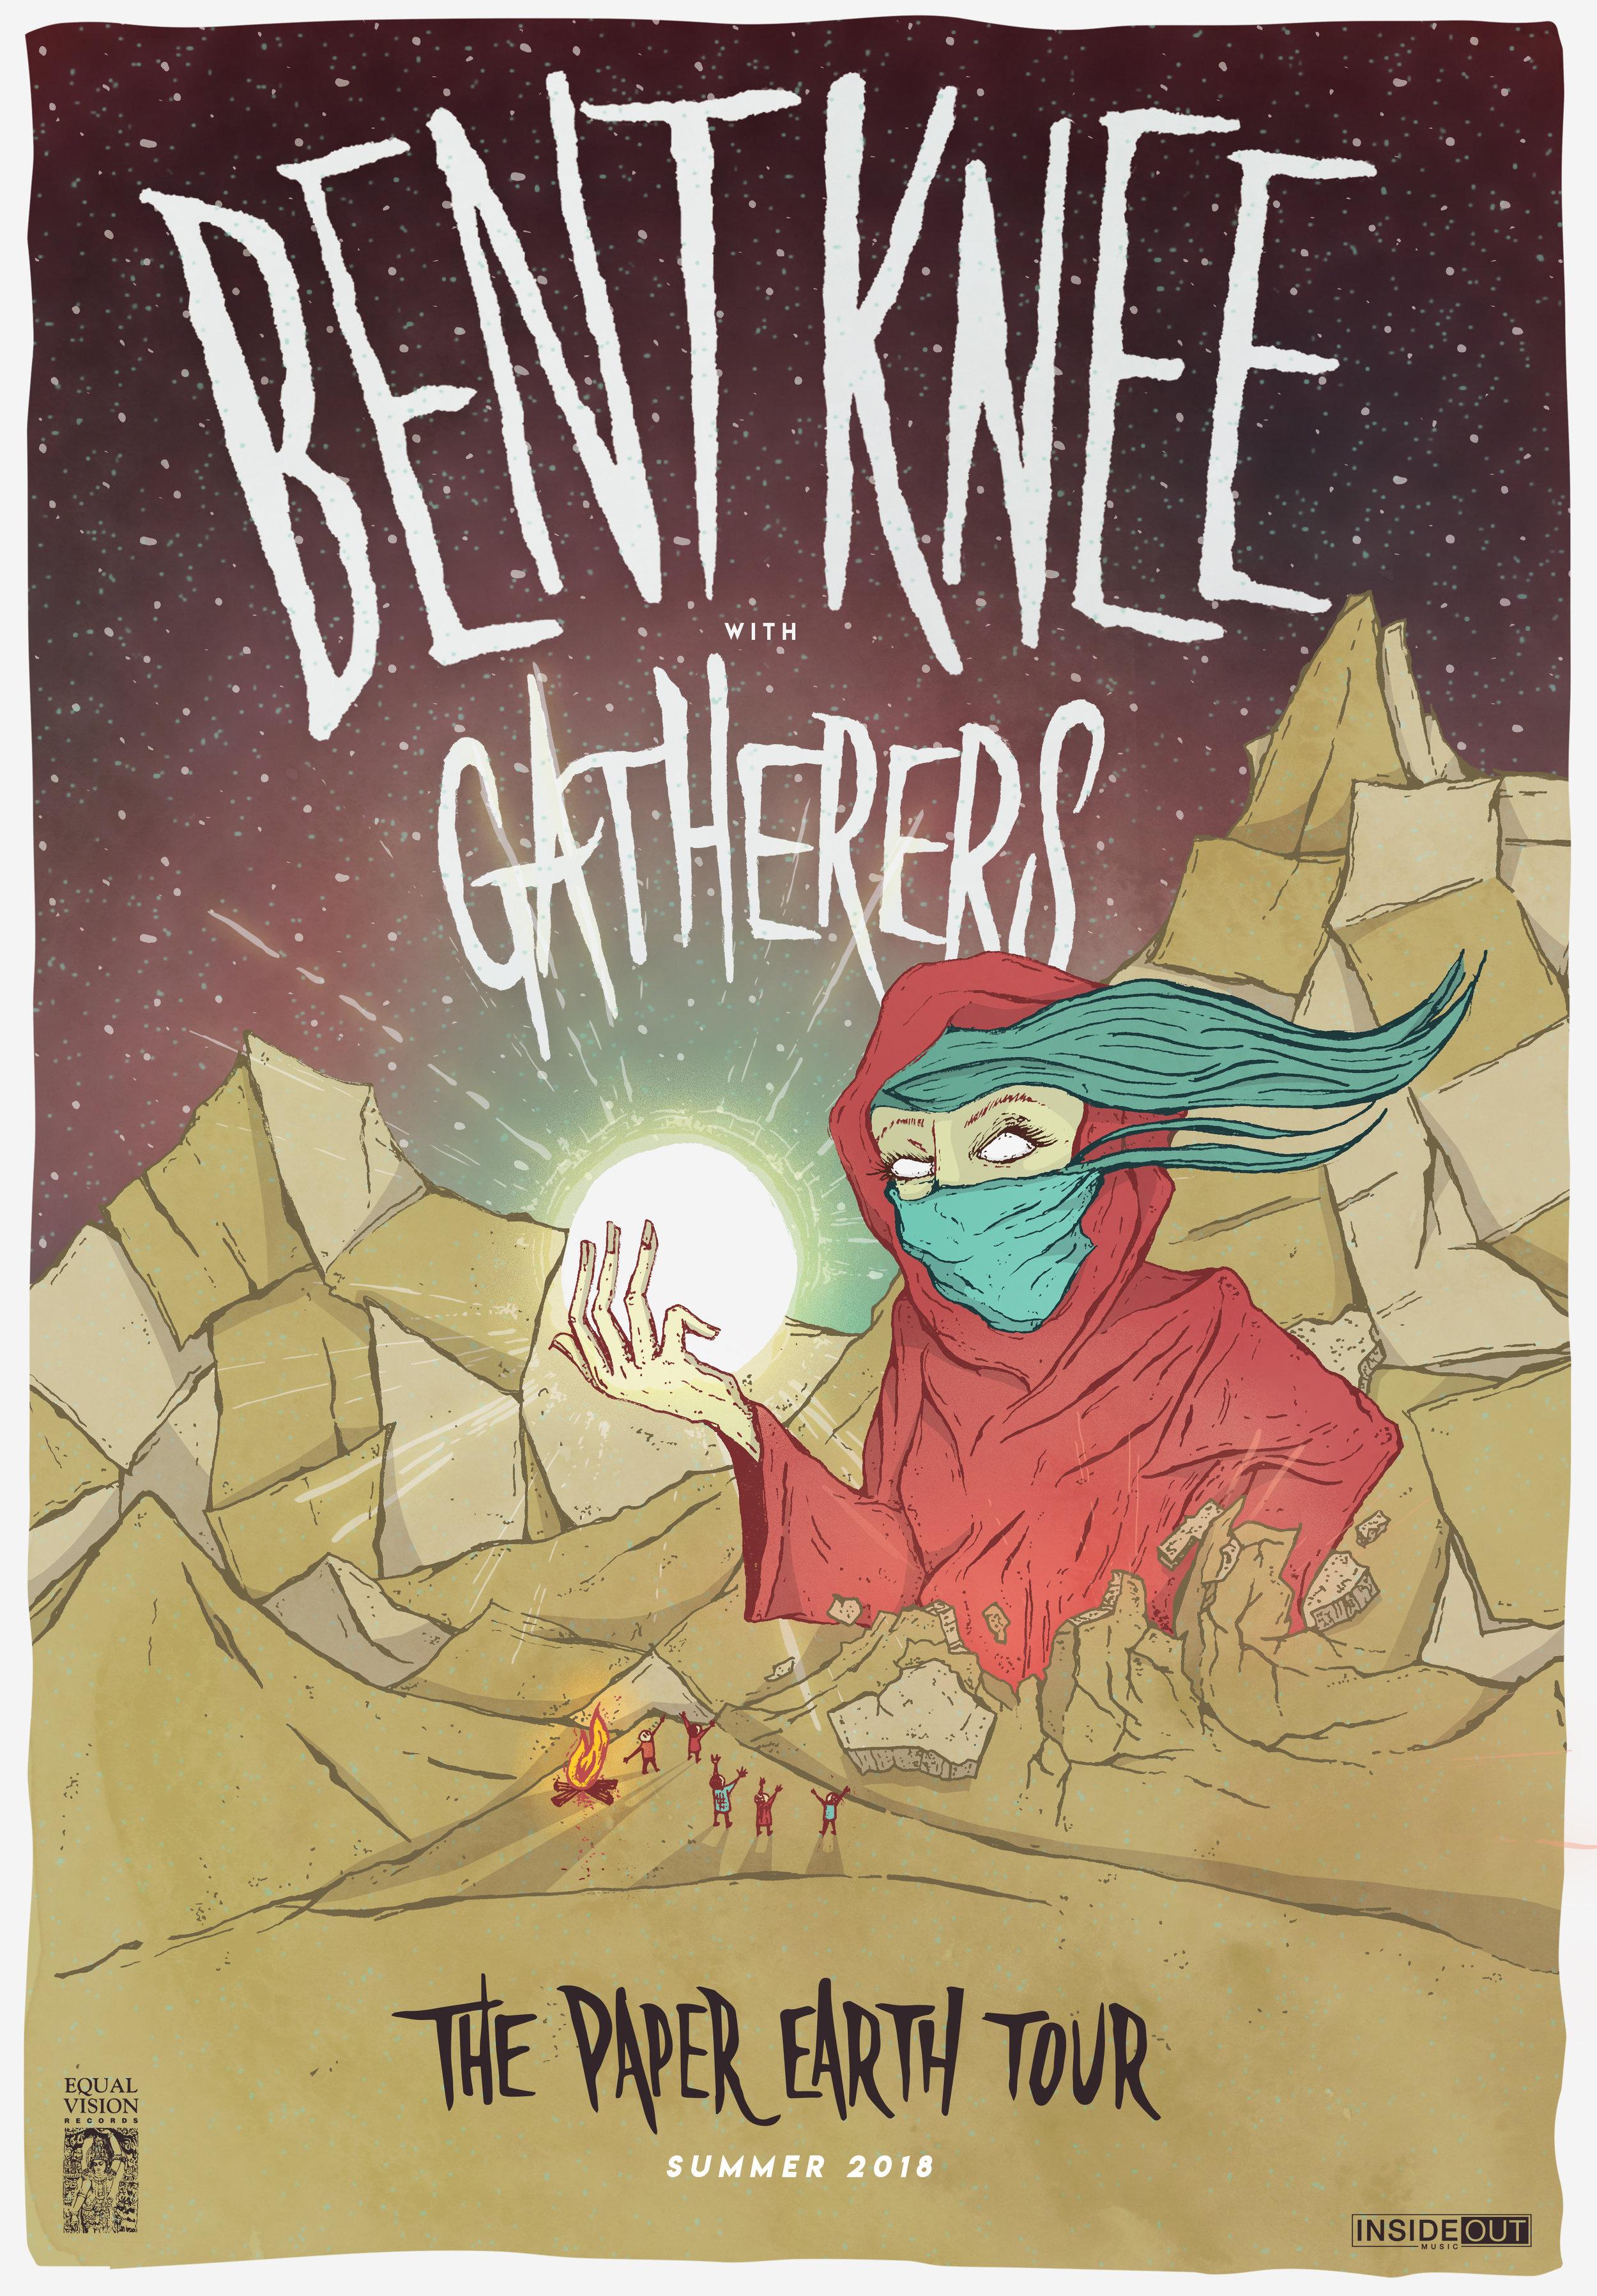 Bent Knee Paper Earth Tour Poster NO ALBUM ANNOUNCEMENT.jpeg